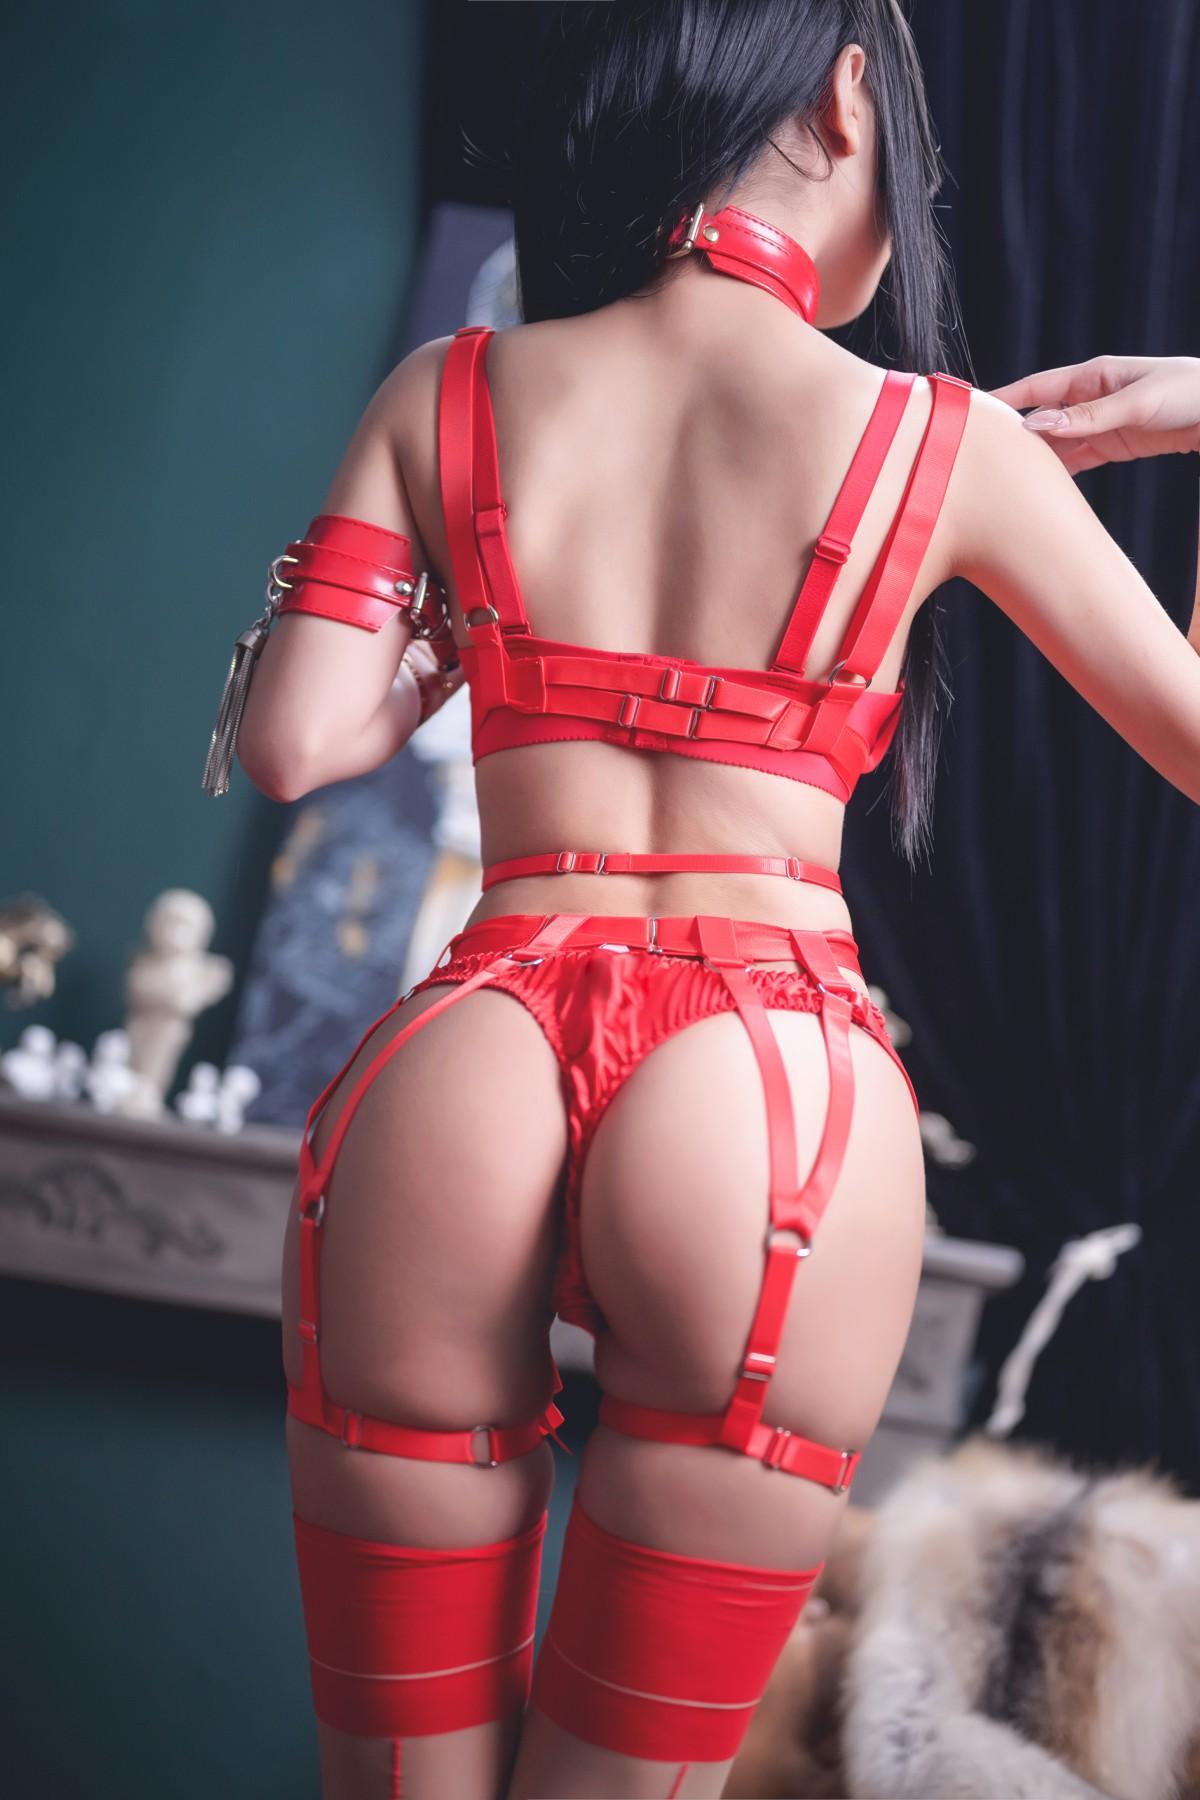 [Cosplay]鬼畜瑶 - 红色束缚 第2张